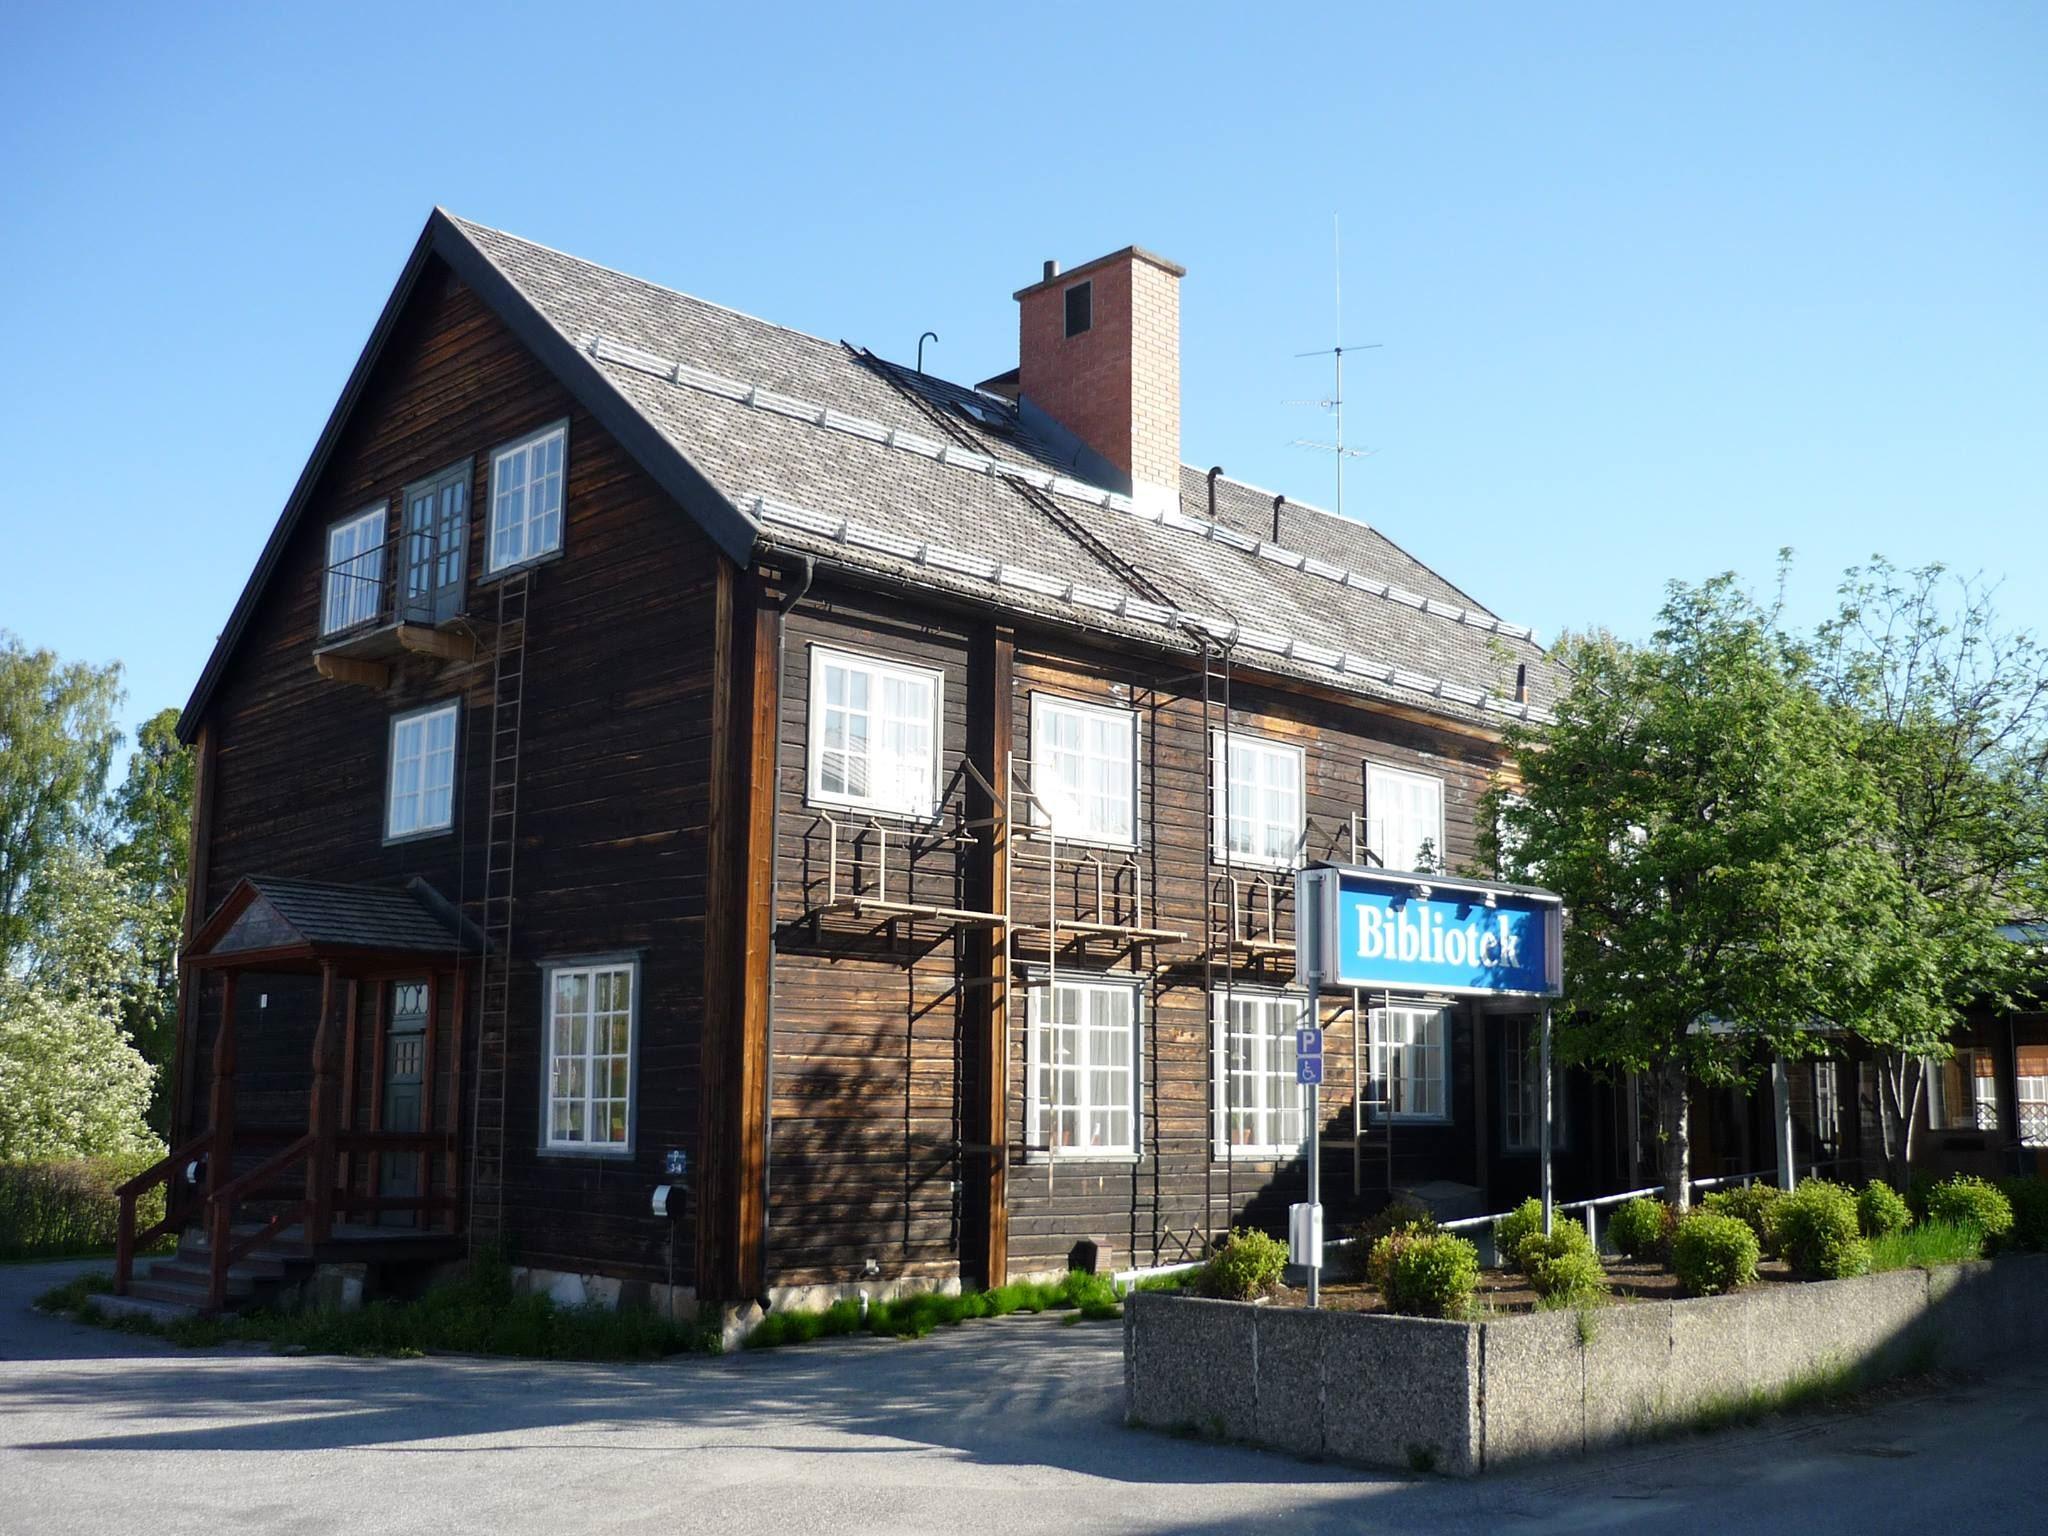 The Storuman library